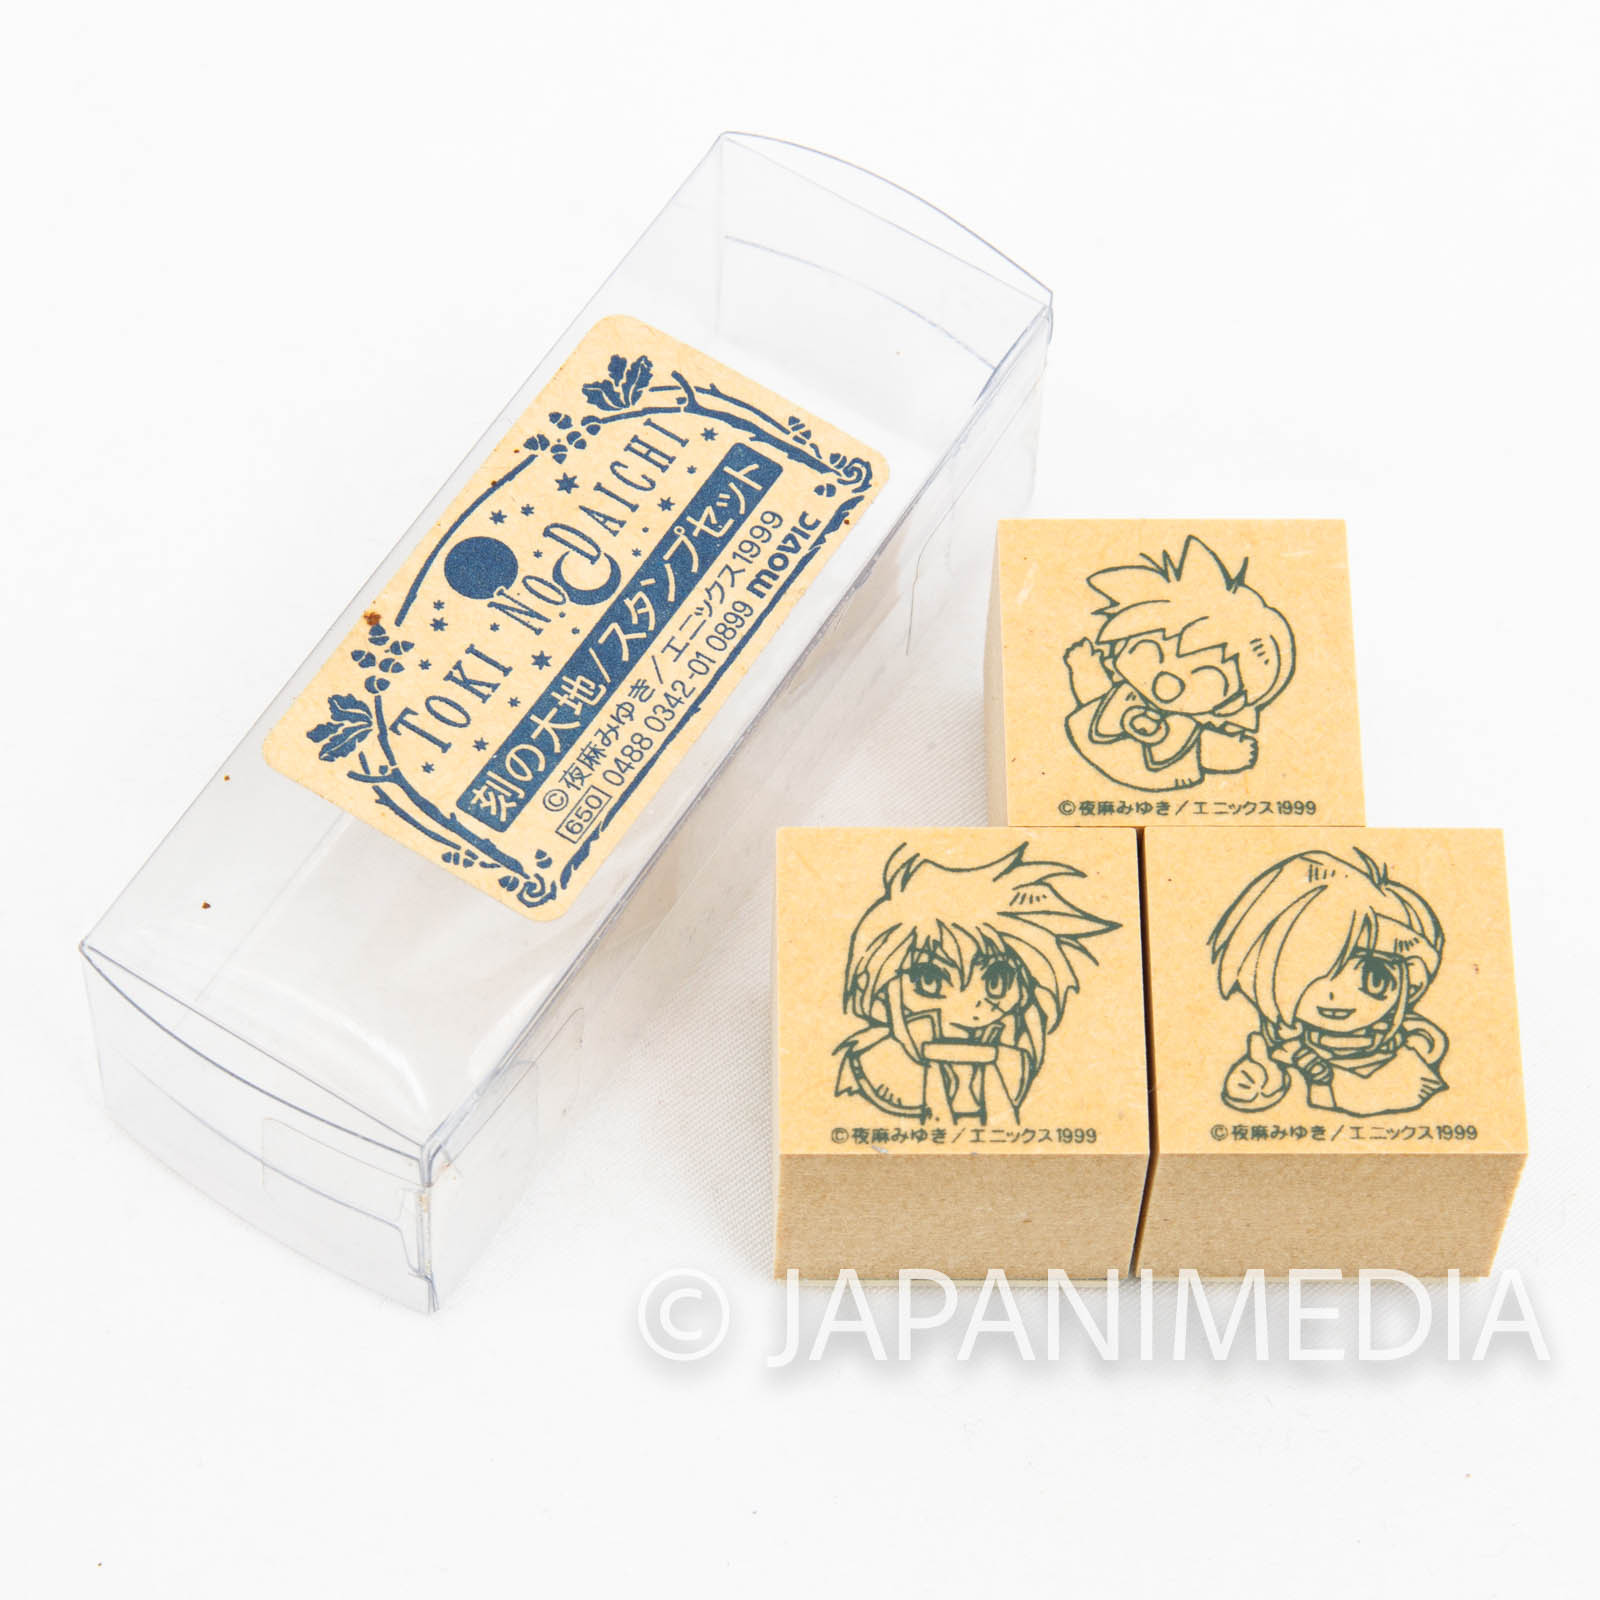 Toki no Daichi Stamp 3pc set [Izayoi | Zyend | Kai ] Miyuki Yama JAPAN MANGA